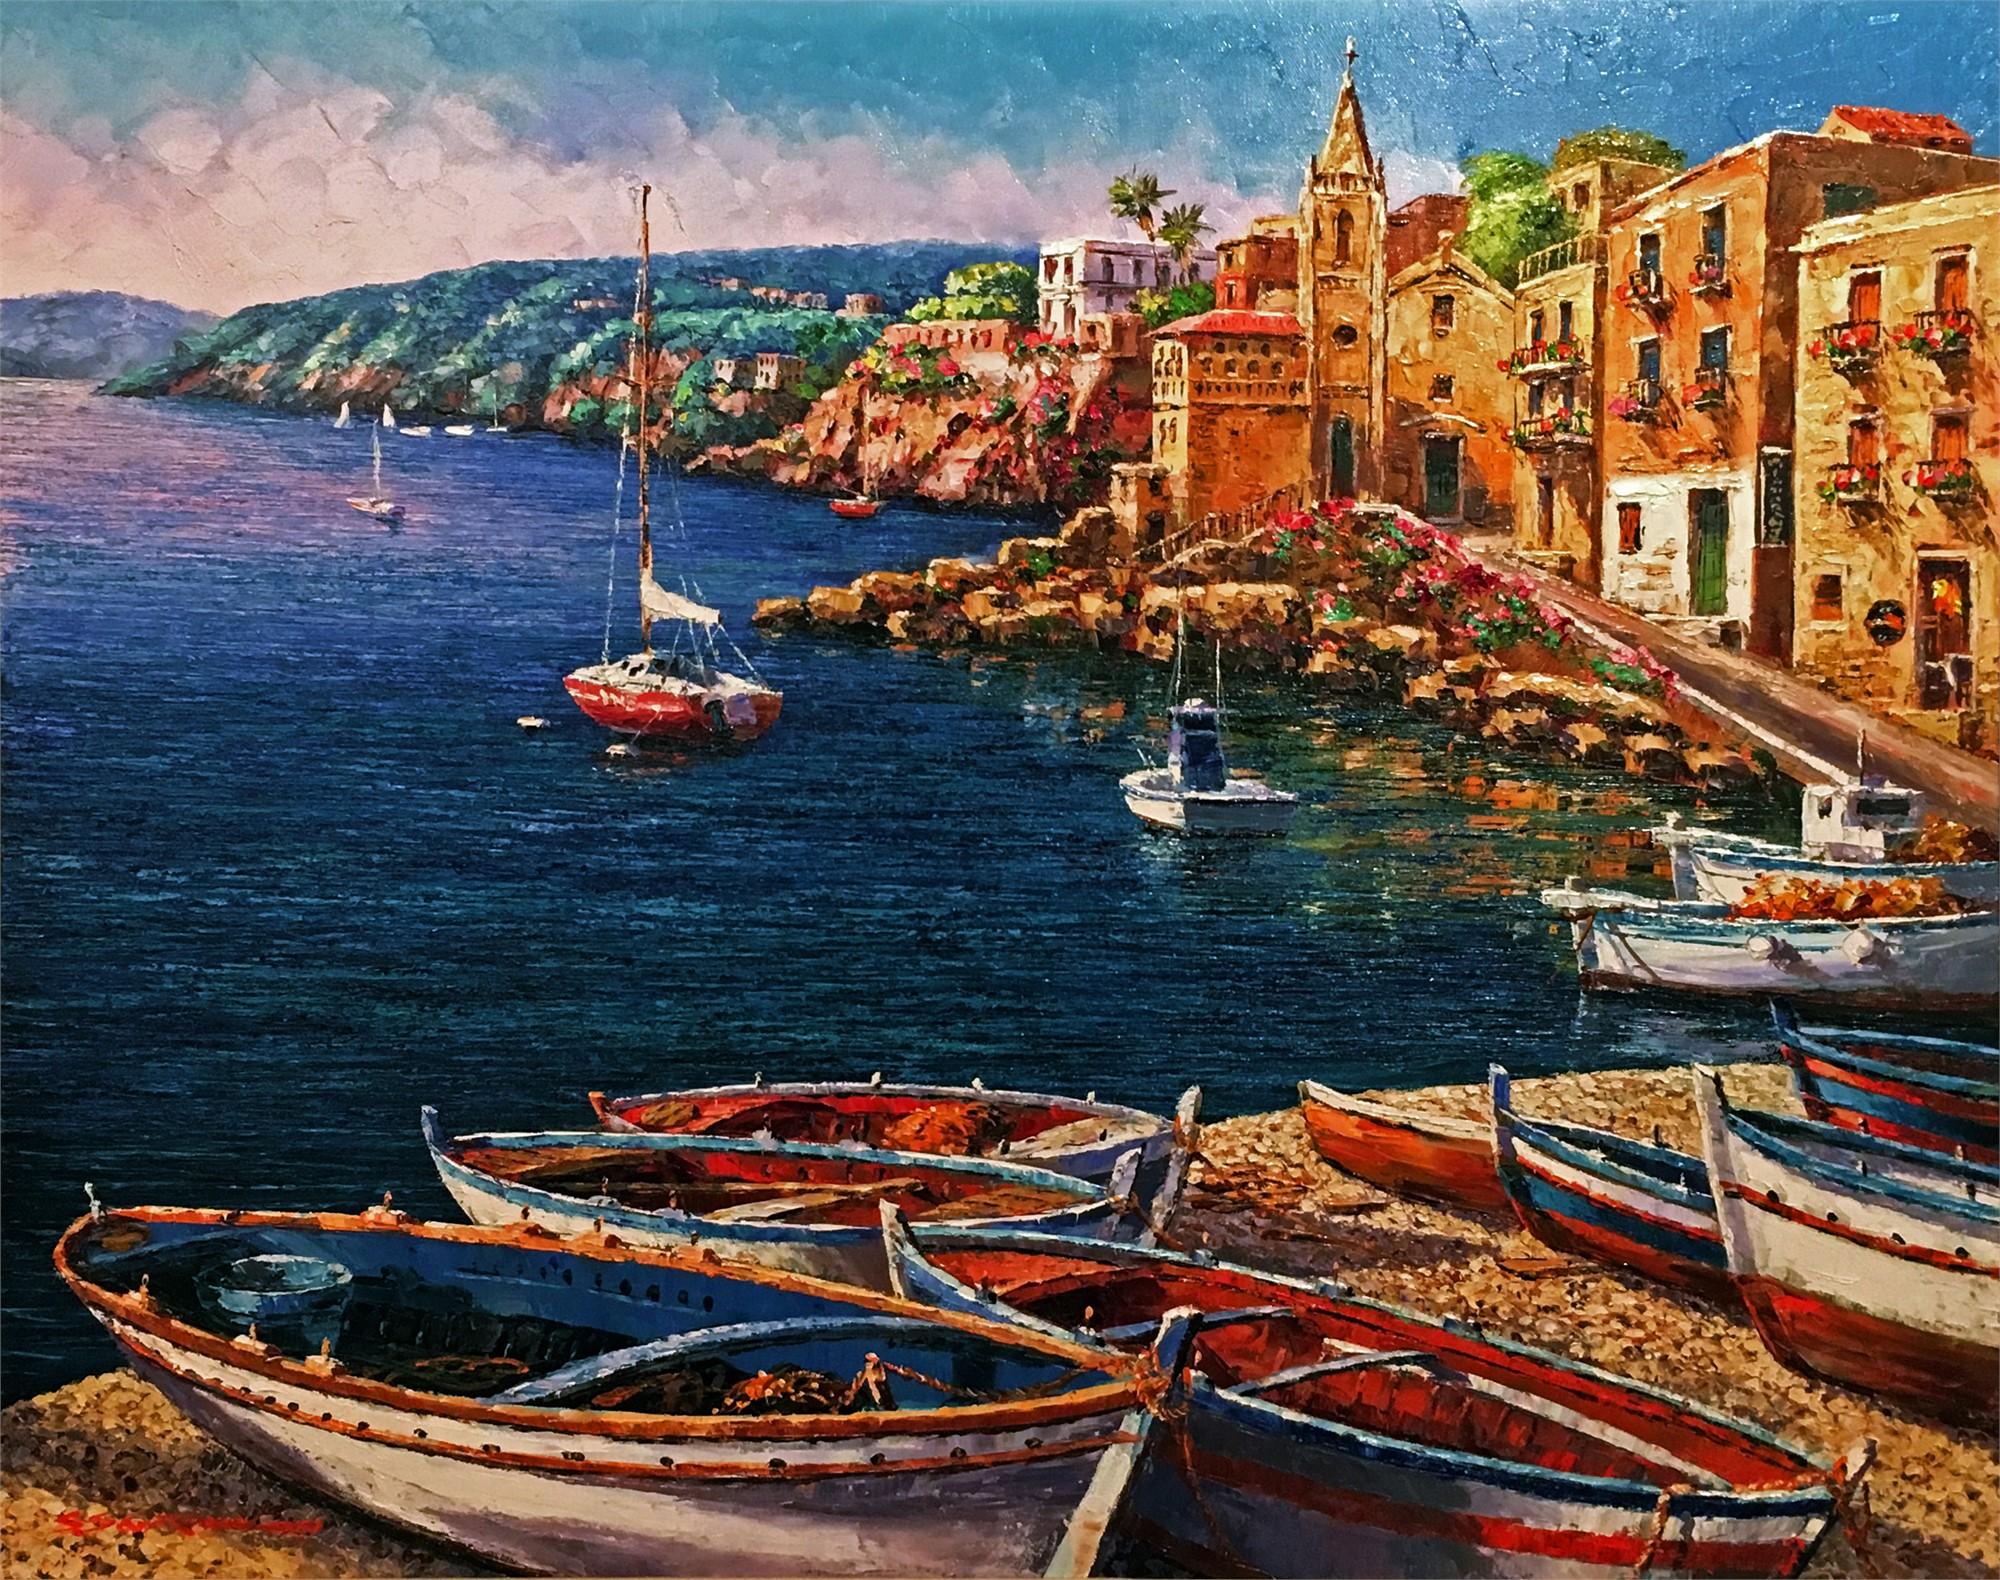 Lipari, Sicily by S. PARK